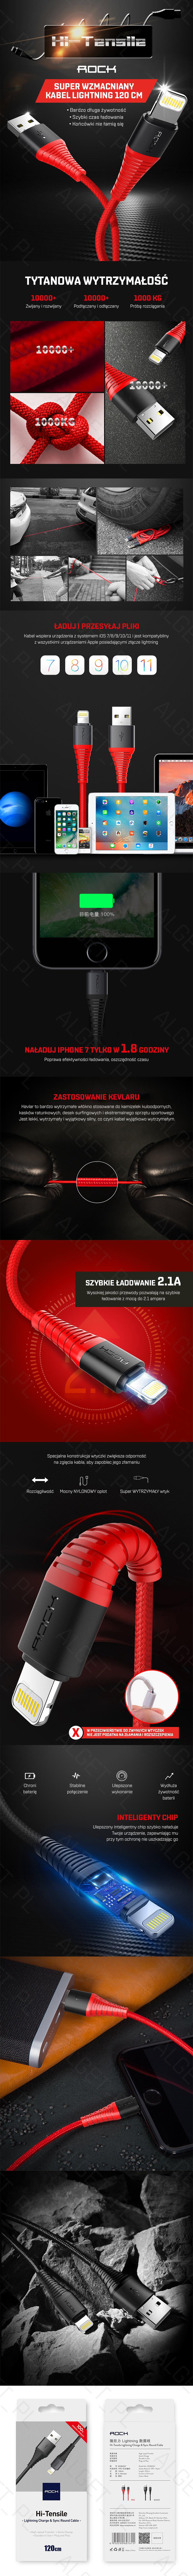 WZMACNIANY Kabel ROCK USB iPhone SE 5 6 7 8 X 10